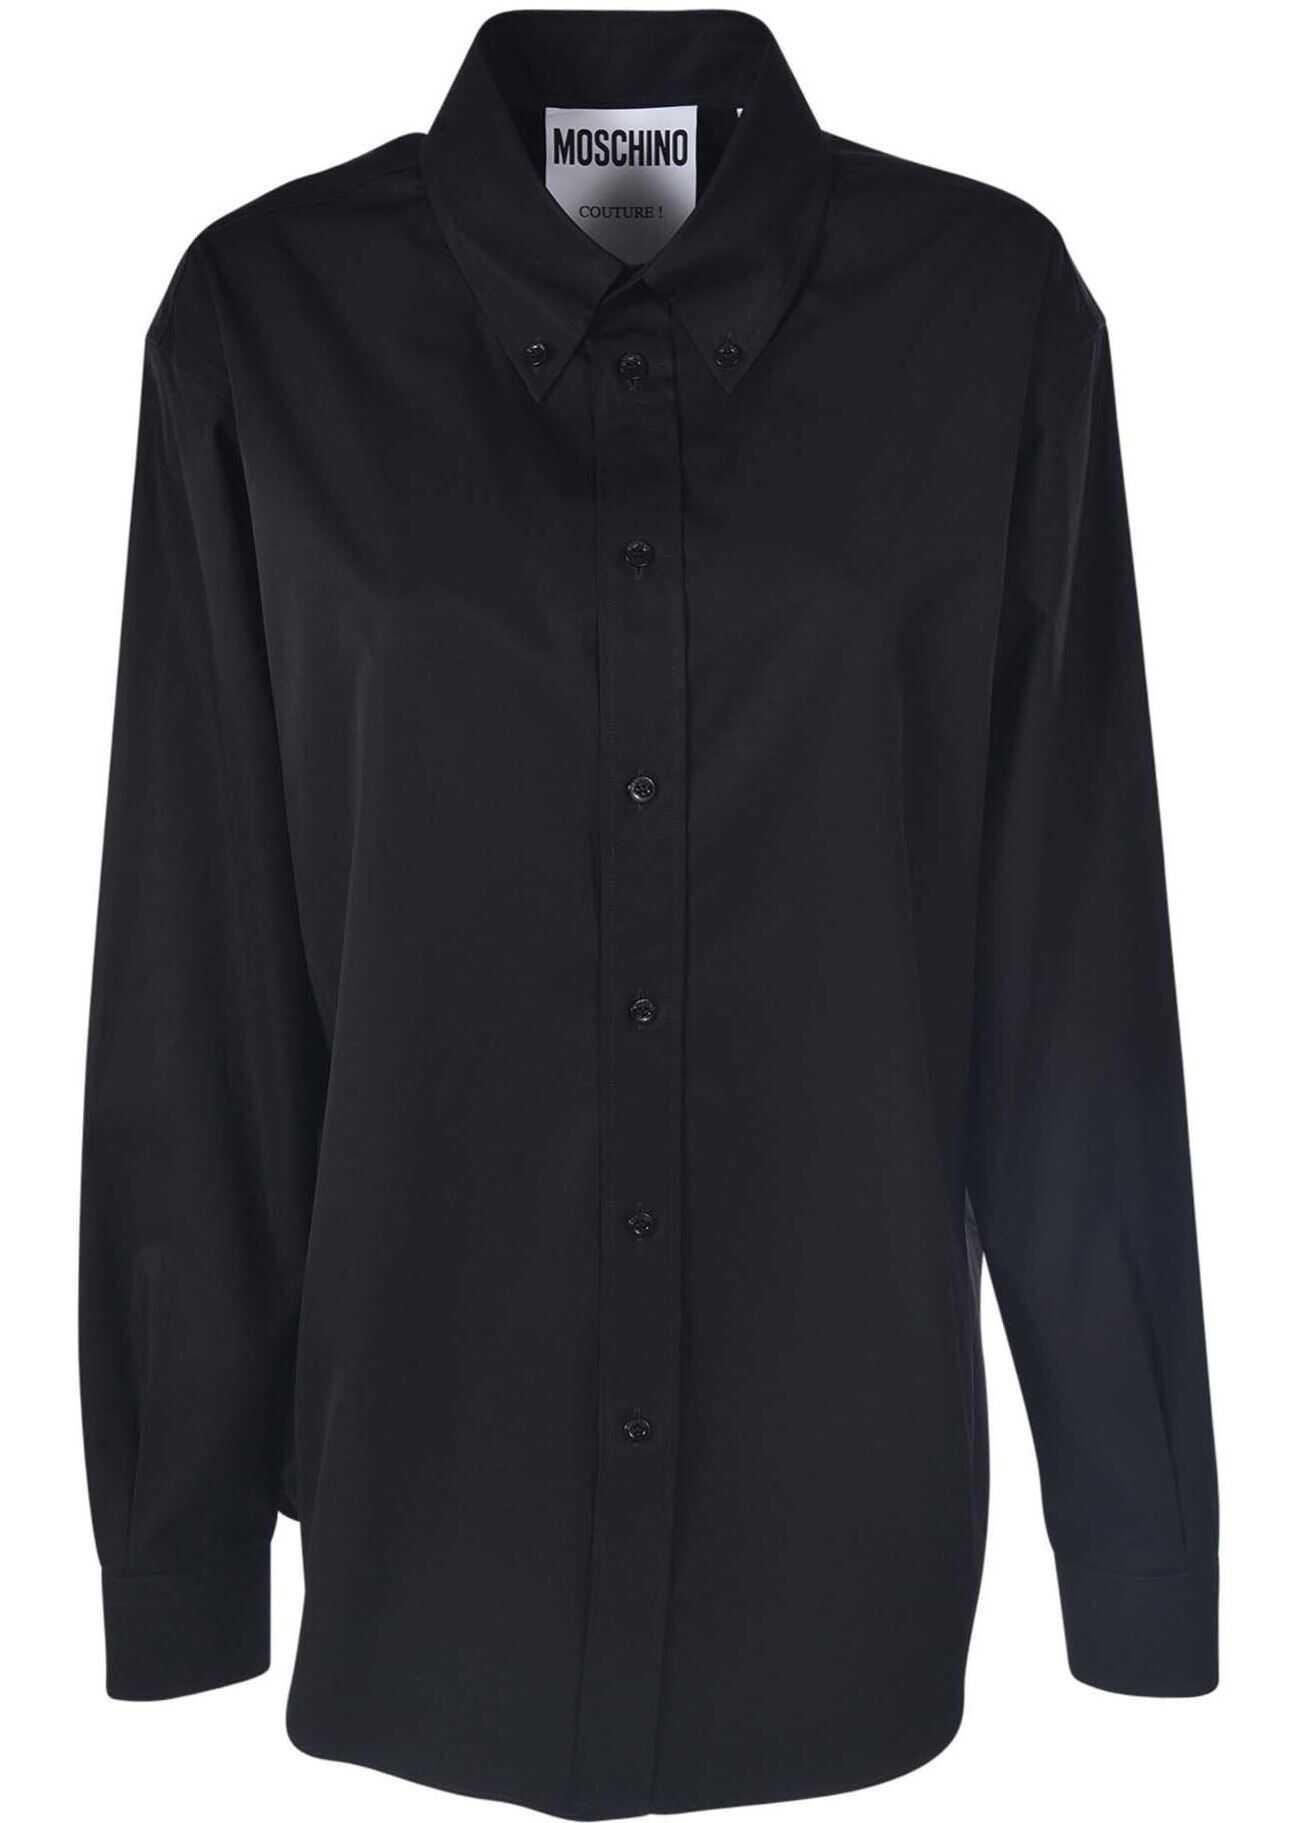 Moschino Button Down Logo Print Shirt In Black Black imagine